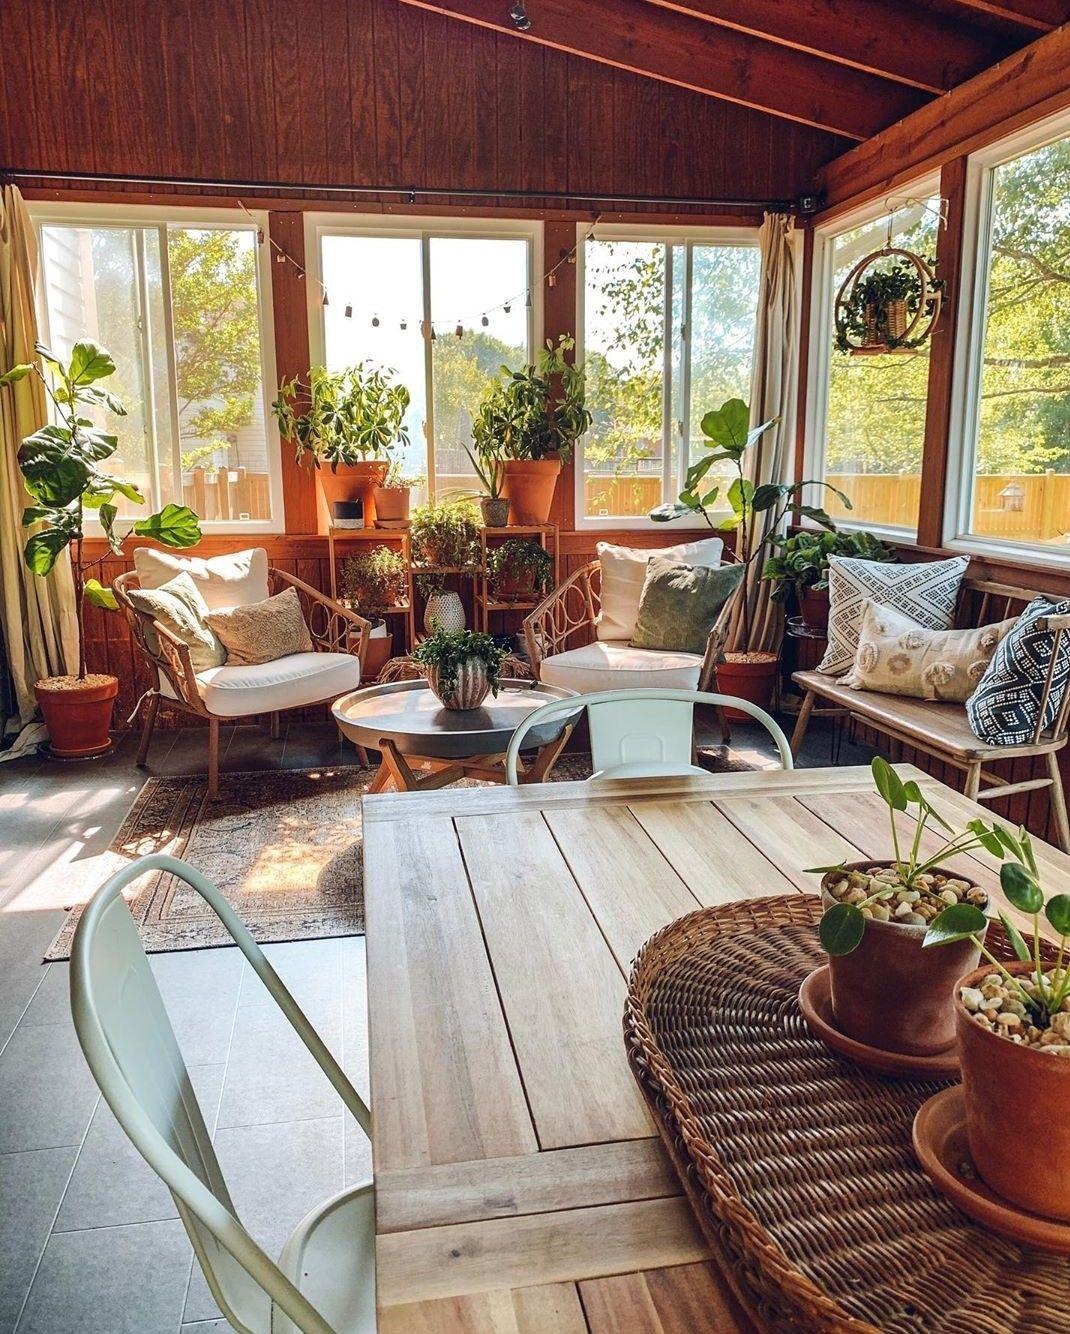 Very cozy Arizona room | Arizona living, New living room ...